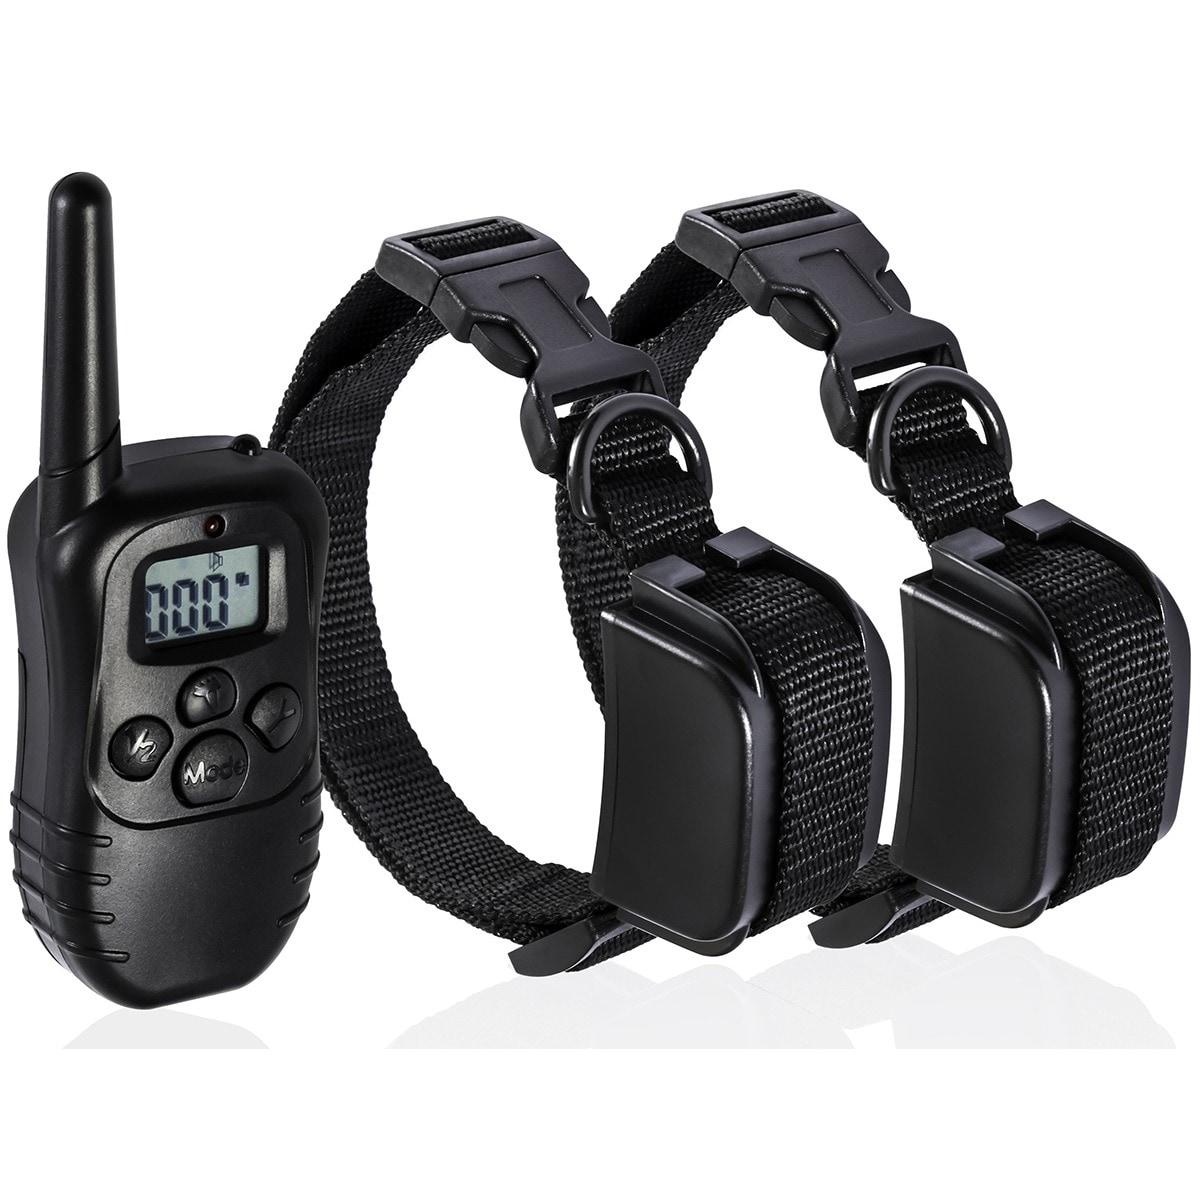 Oxgord Rechargeable Waterproof Dog Training Collar (Dog T...